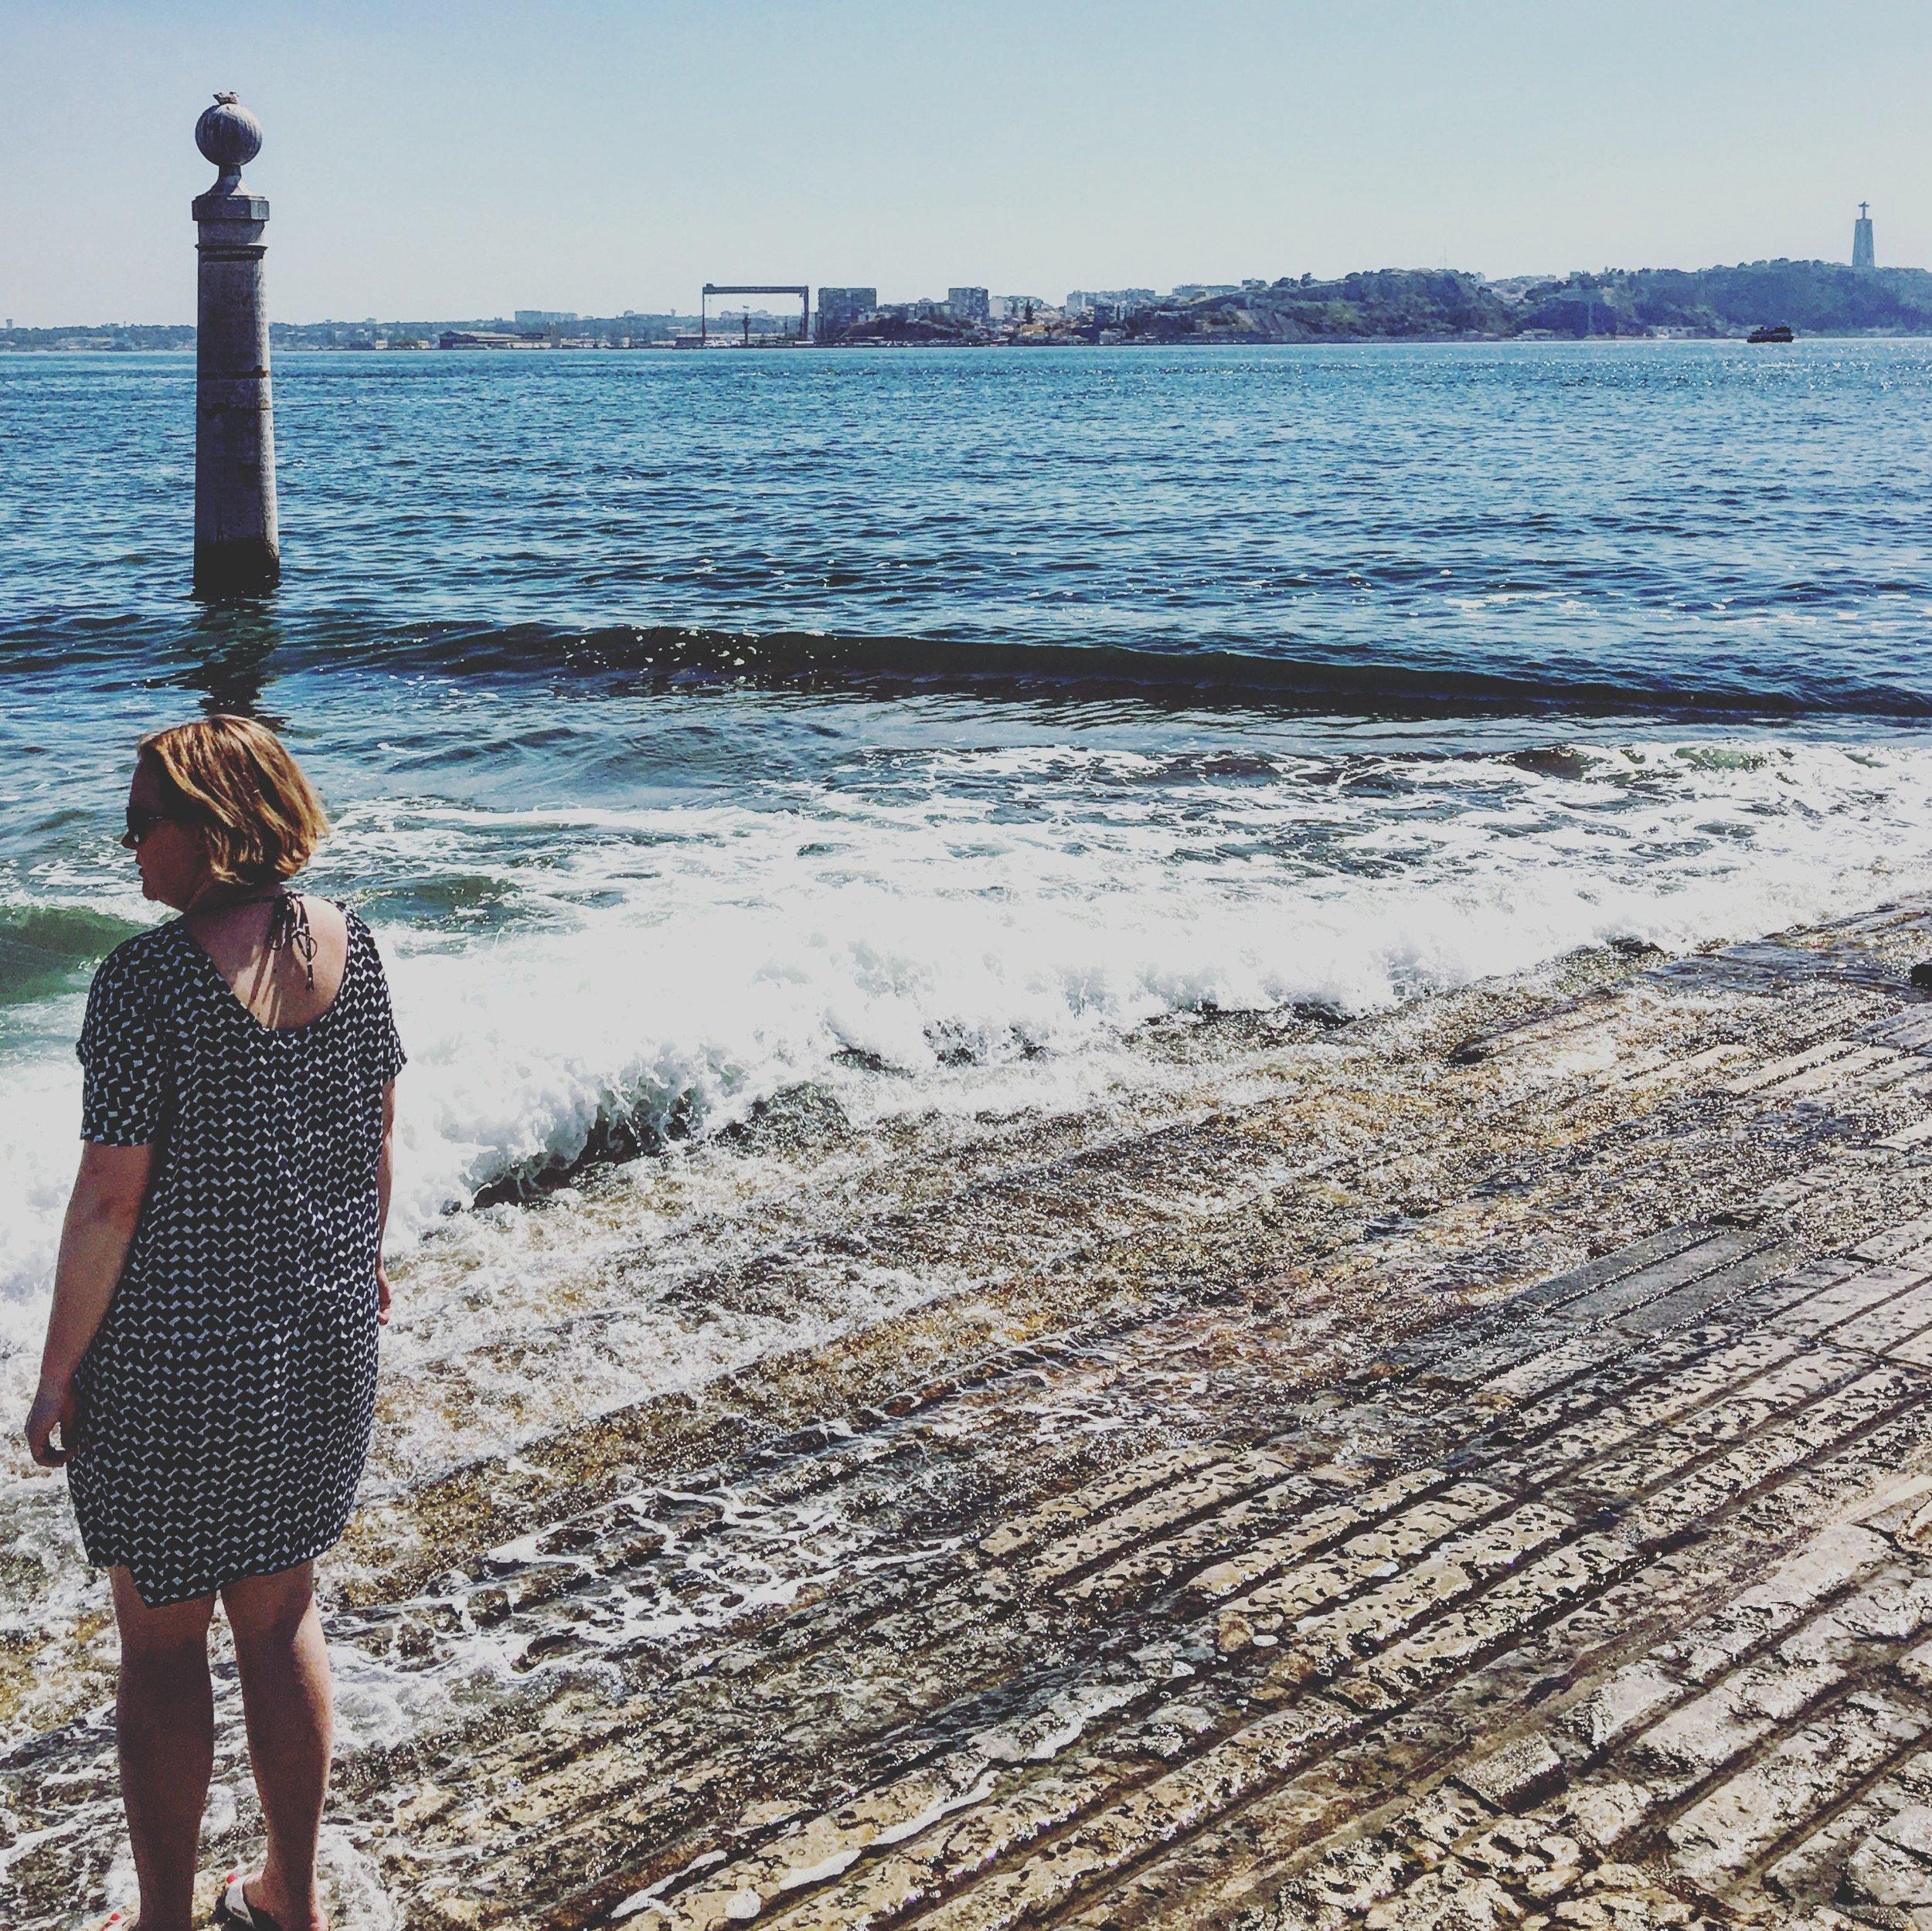 Paddling in the Rio Tajo, Lisbon - summer 2016.